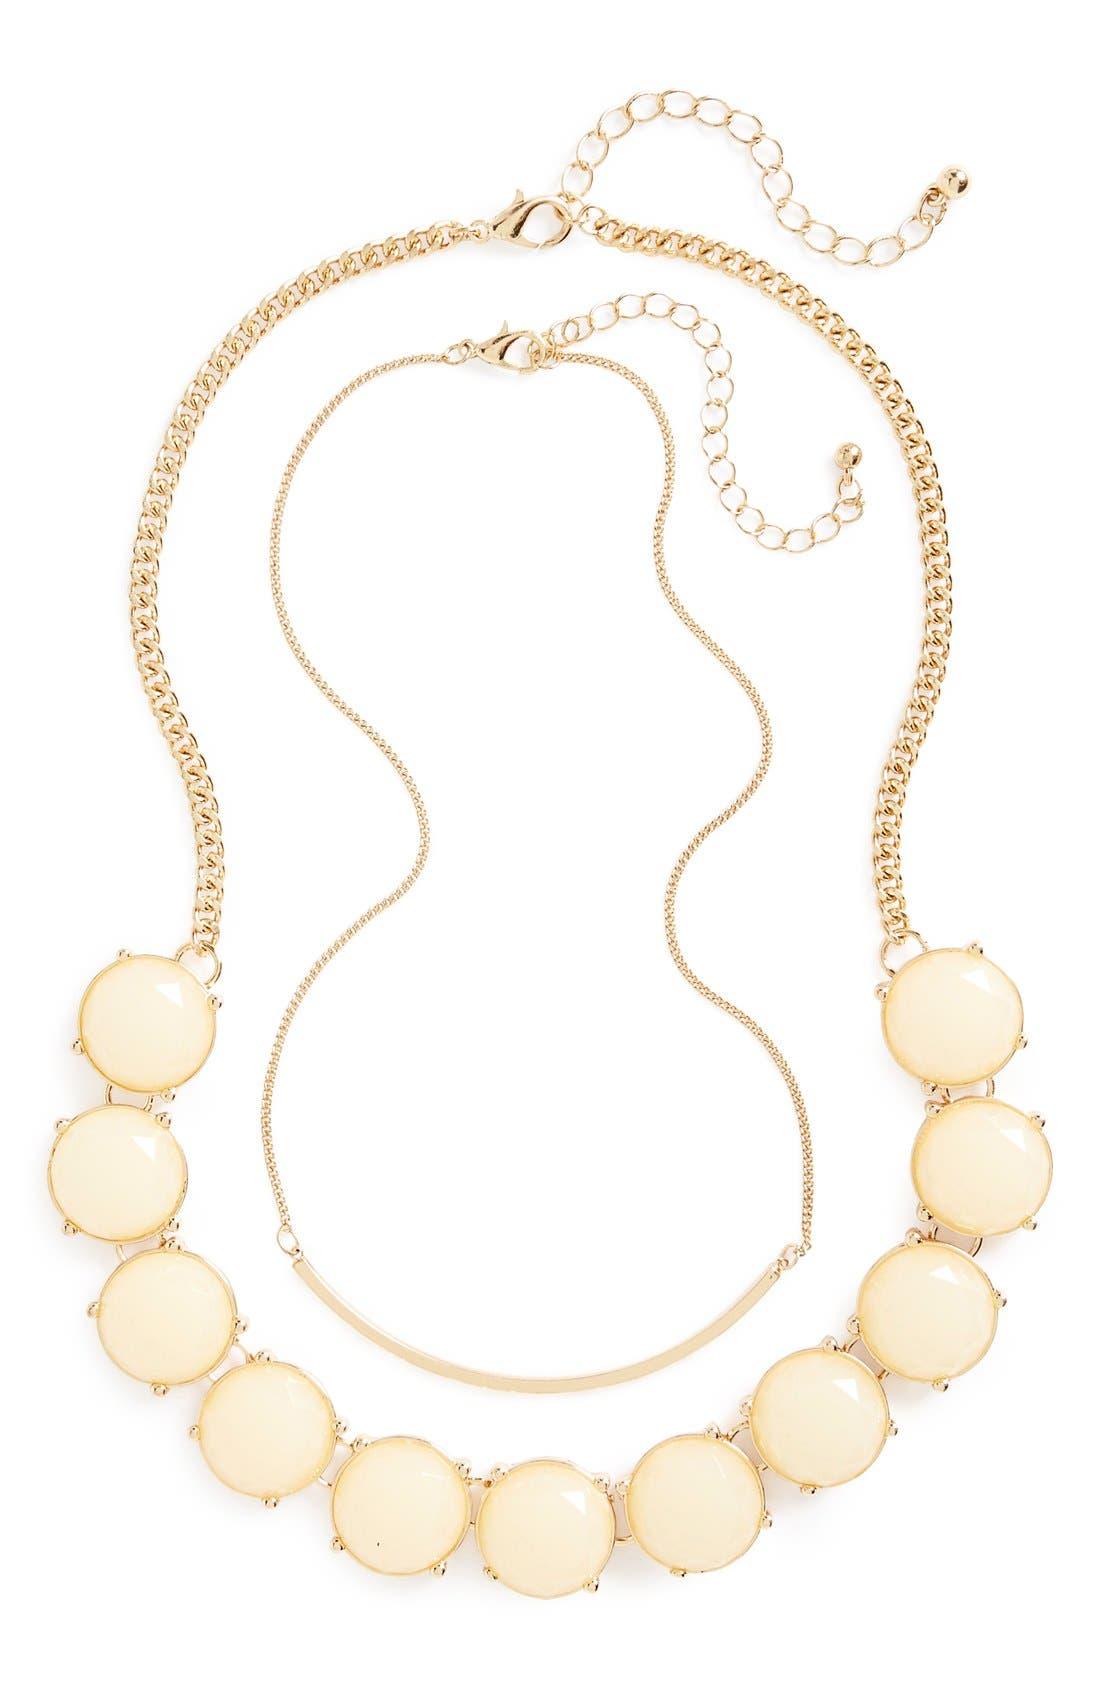 Main Image - BP. Bar & Round Stone Layered Necklaces (Set of 2)